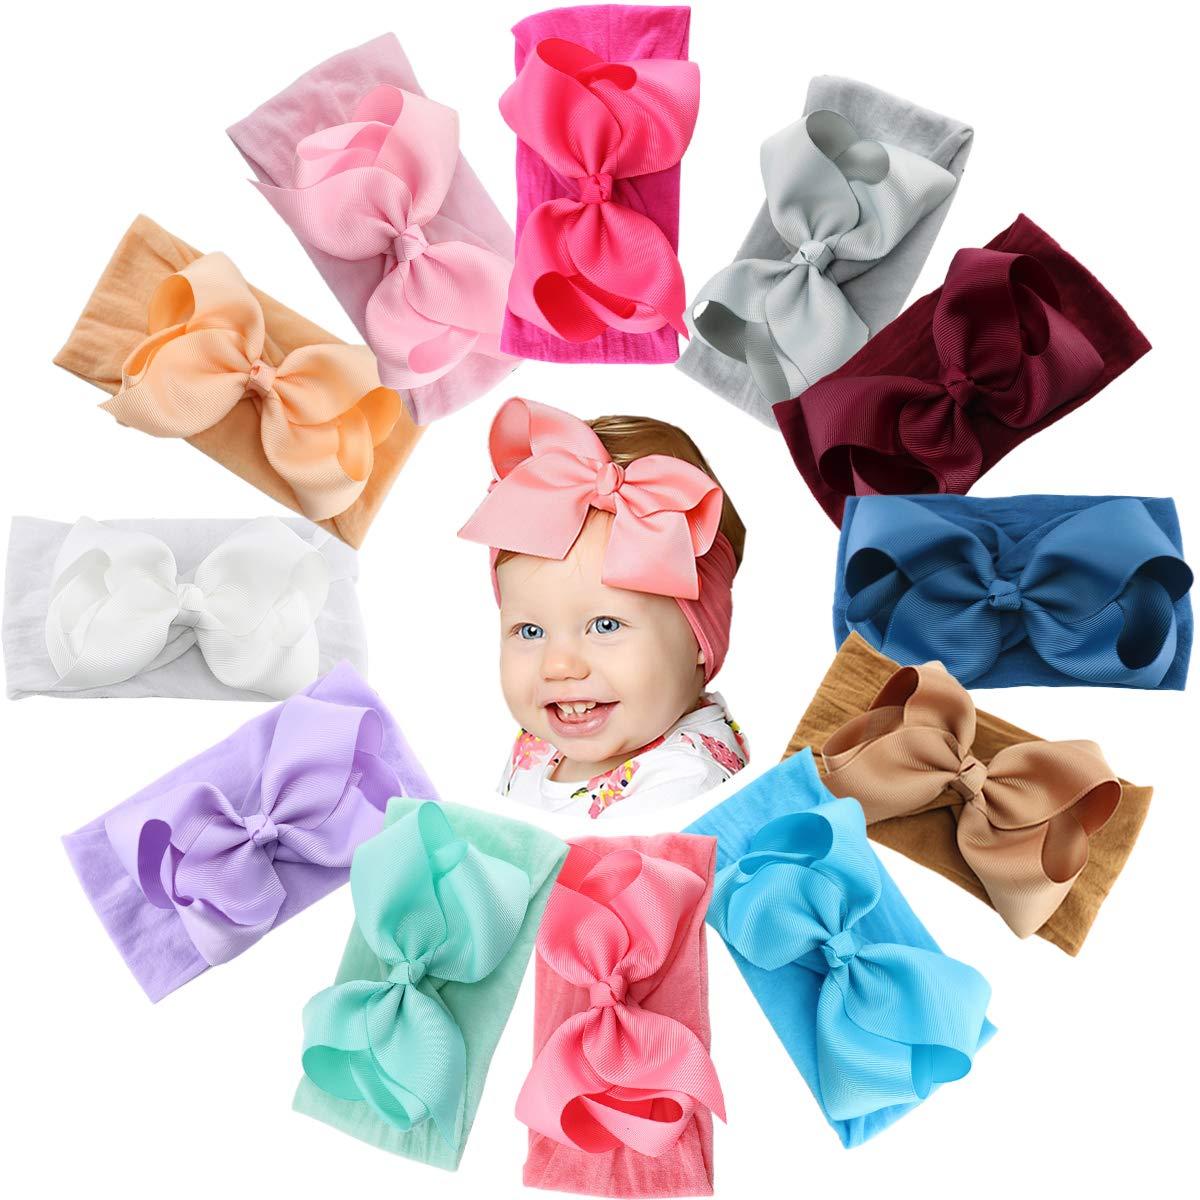 Ded 4 Inch Grosgrain Ribbon Baby Hair Bows Headbands Hair Bow Nylon Headband For